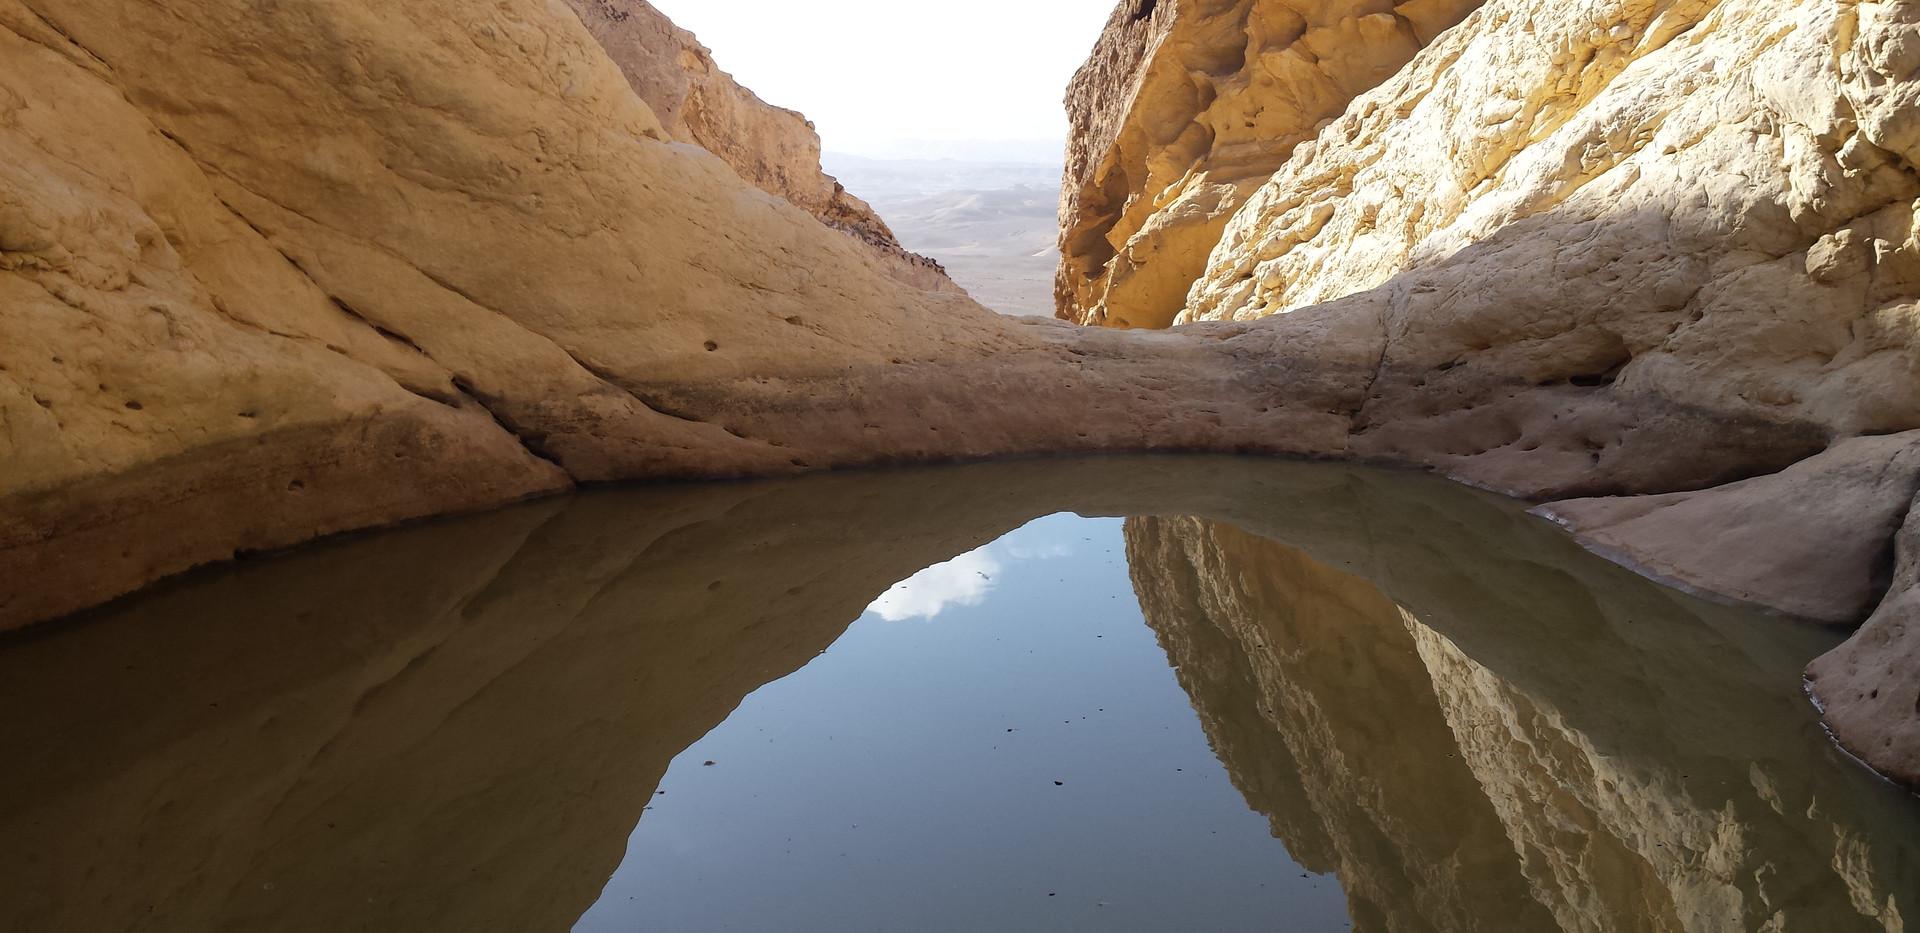 Wadi Efran